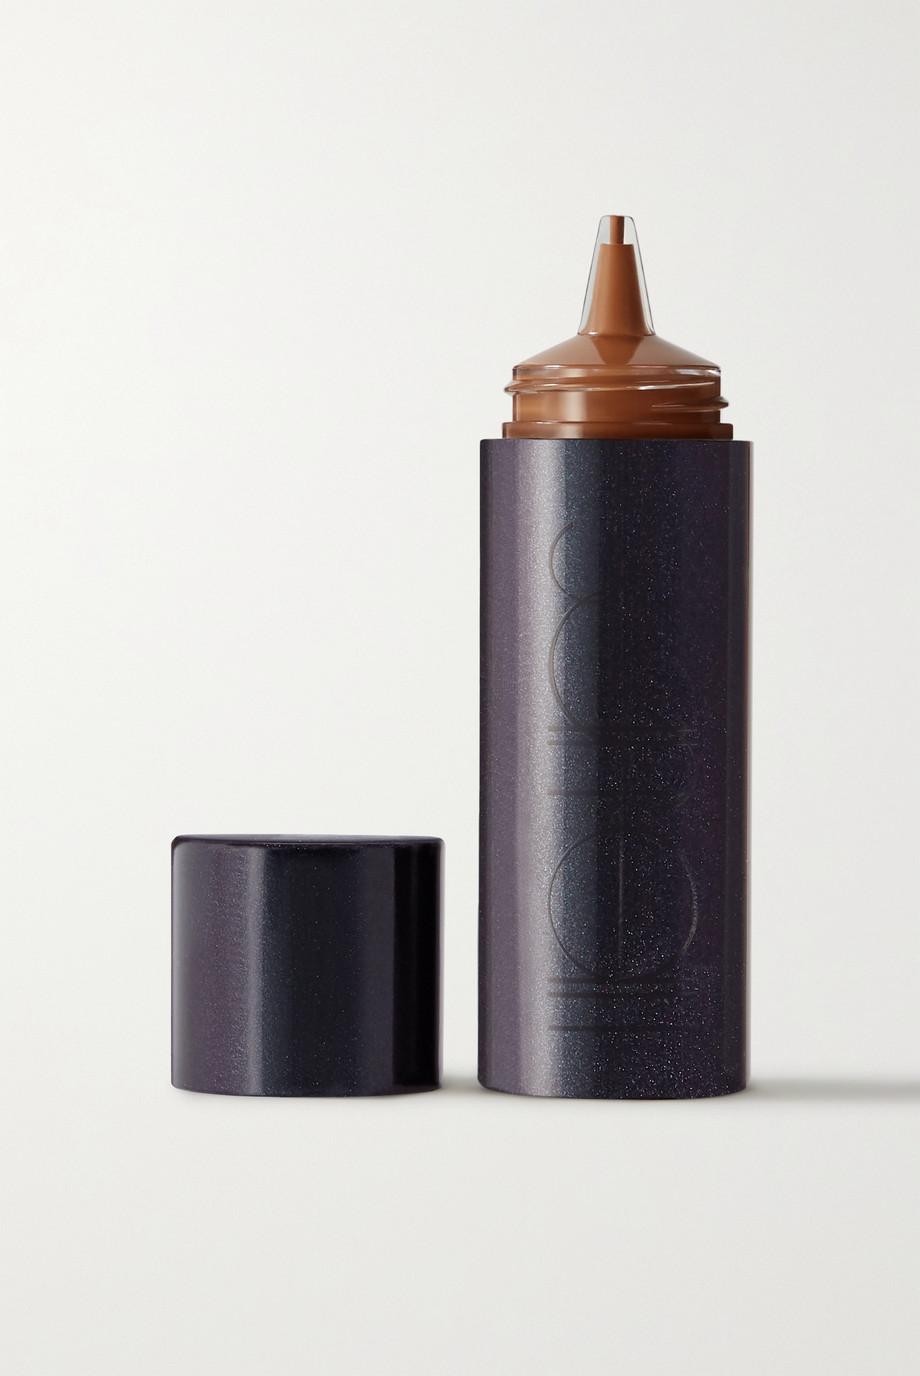 Surratt Beauty Dew Drop Foundation – 15, 19 ml – Foundation